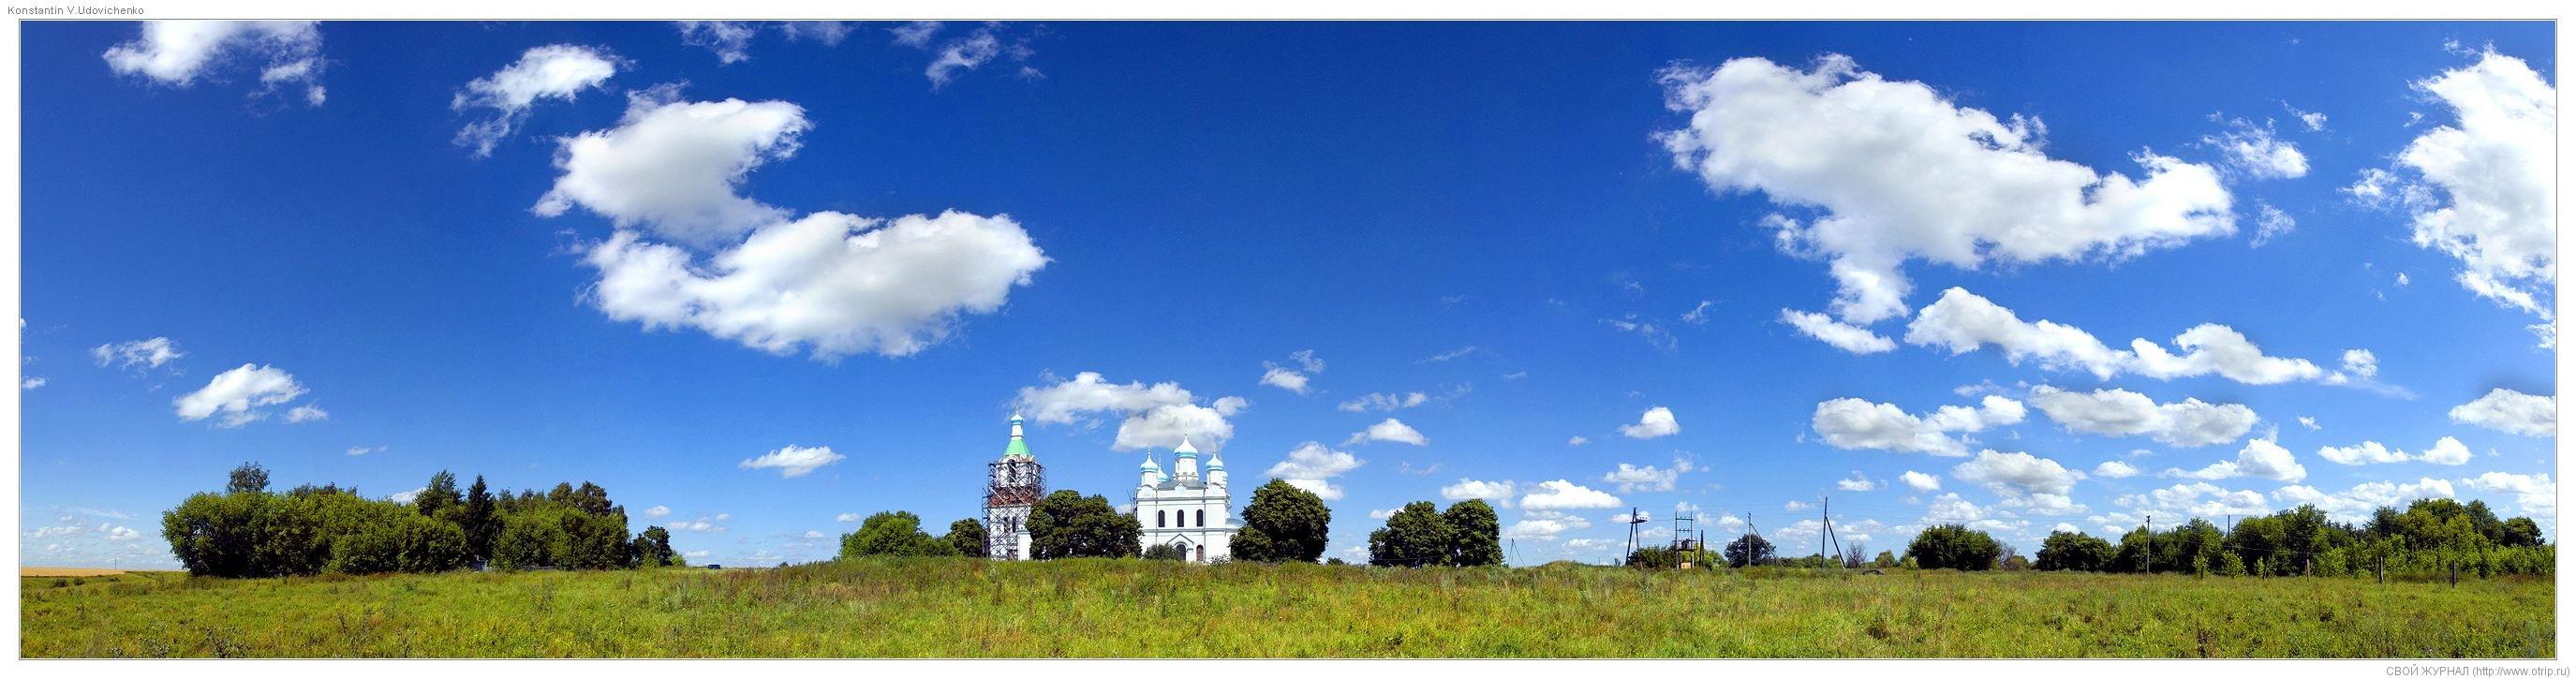 1894-1904-9579x2780s_2.jpg - По Рязанской области (25-29.07.2009)